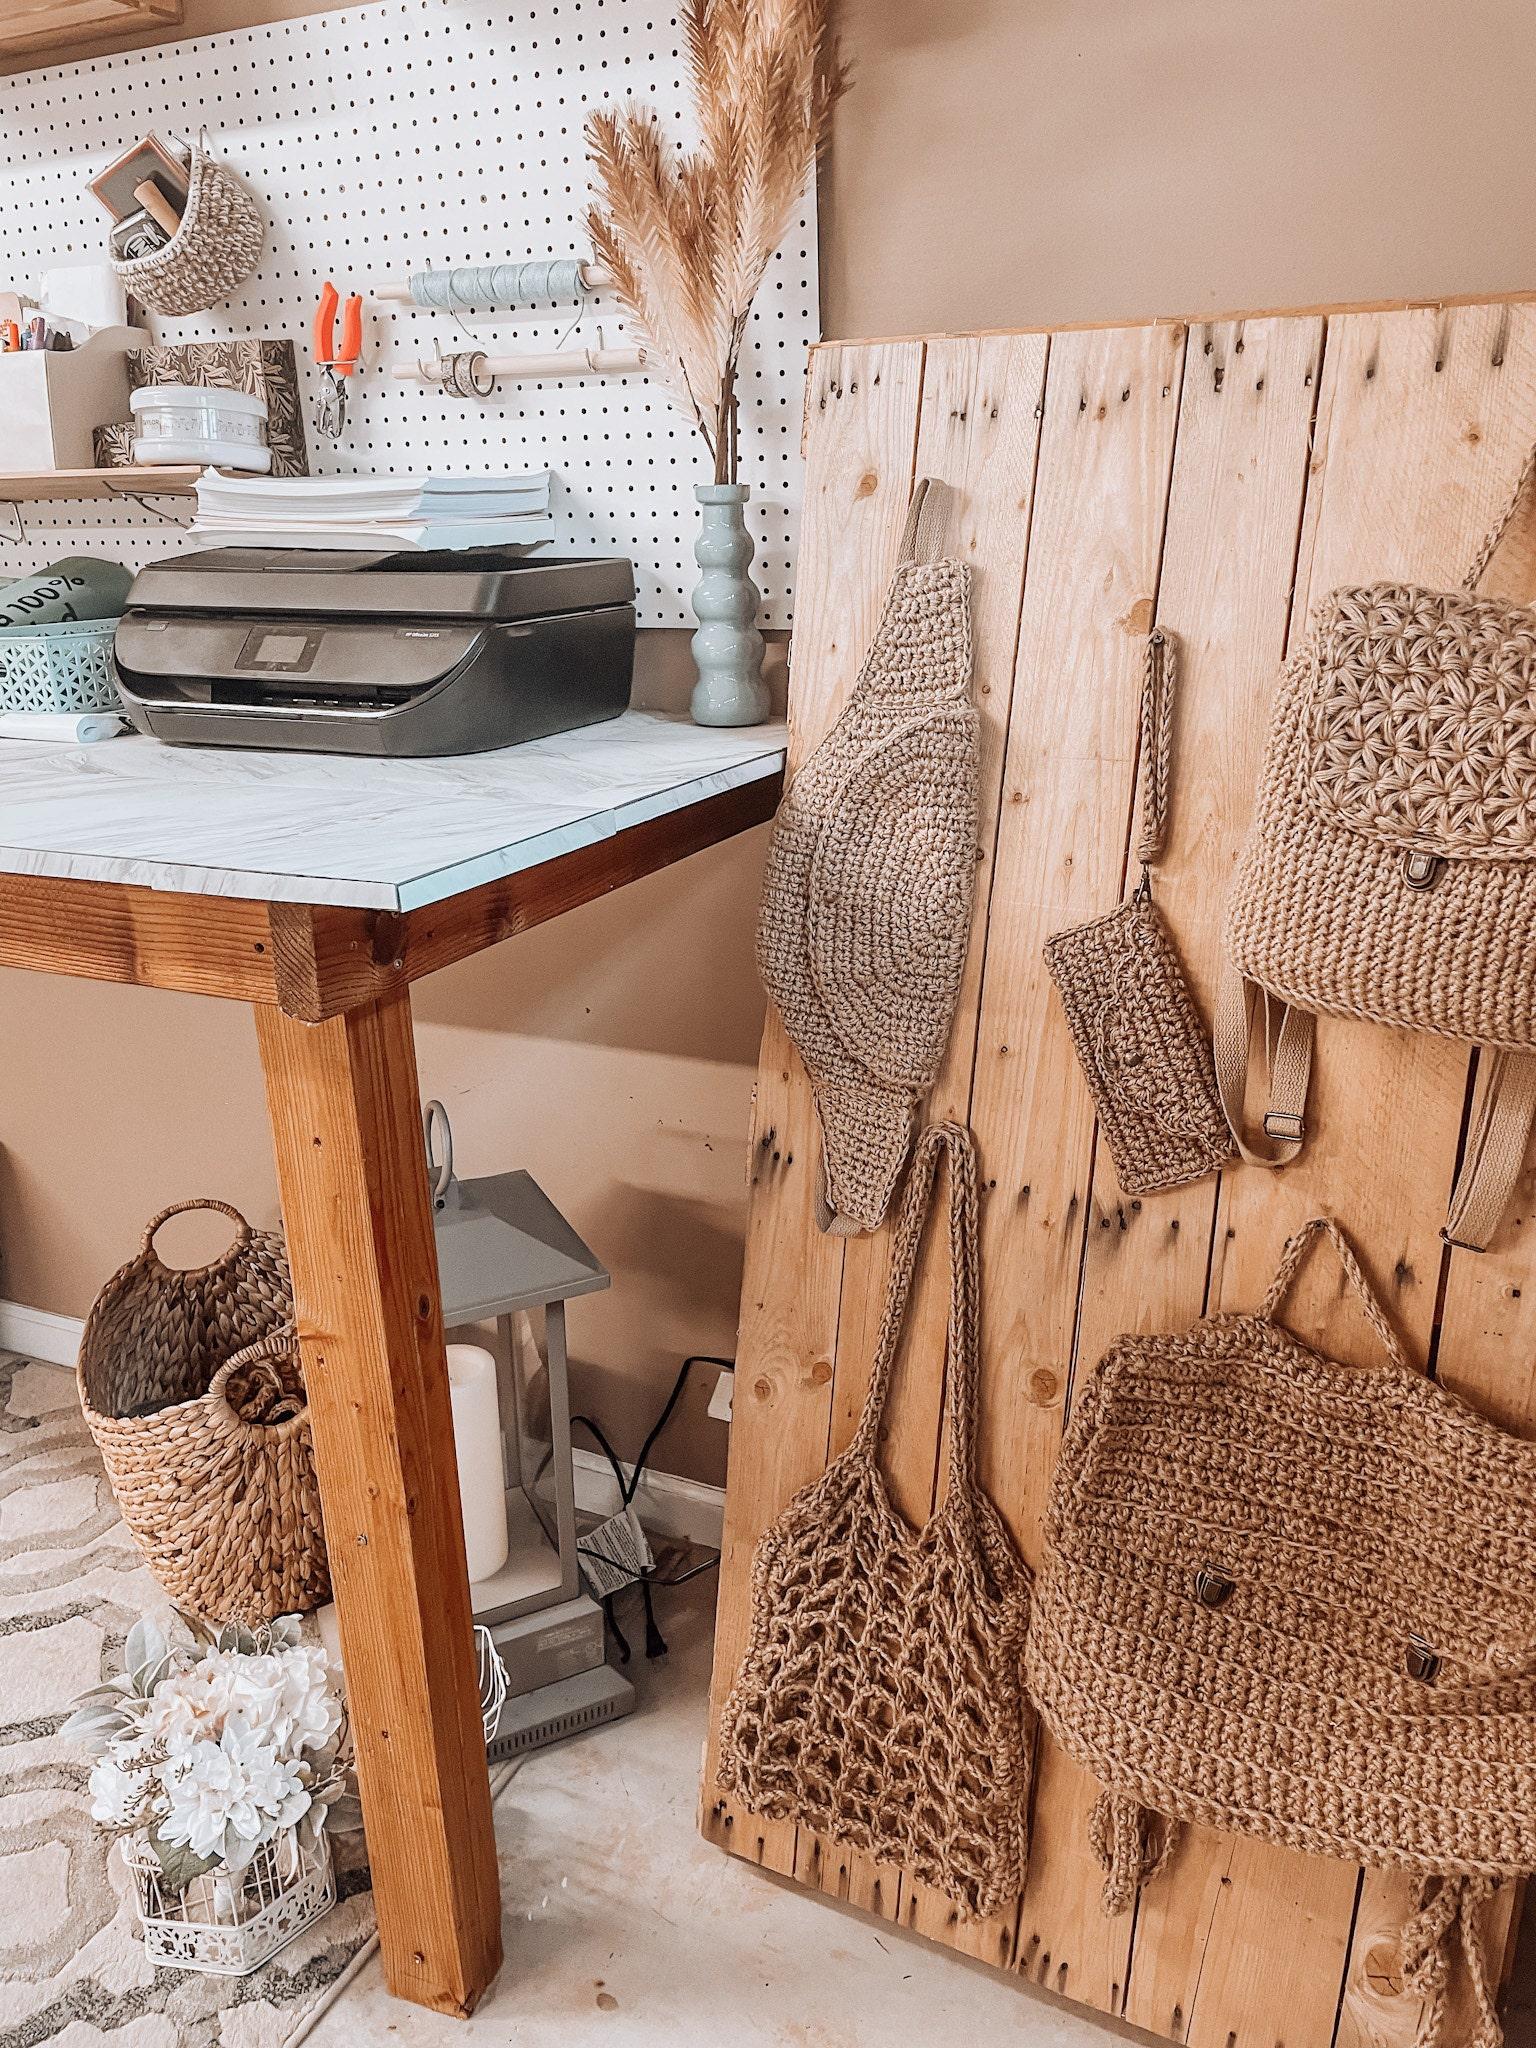 Crochet bag display